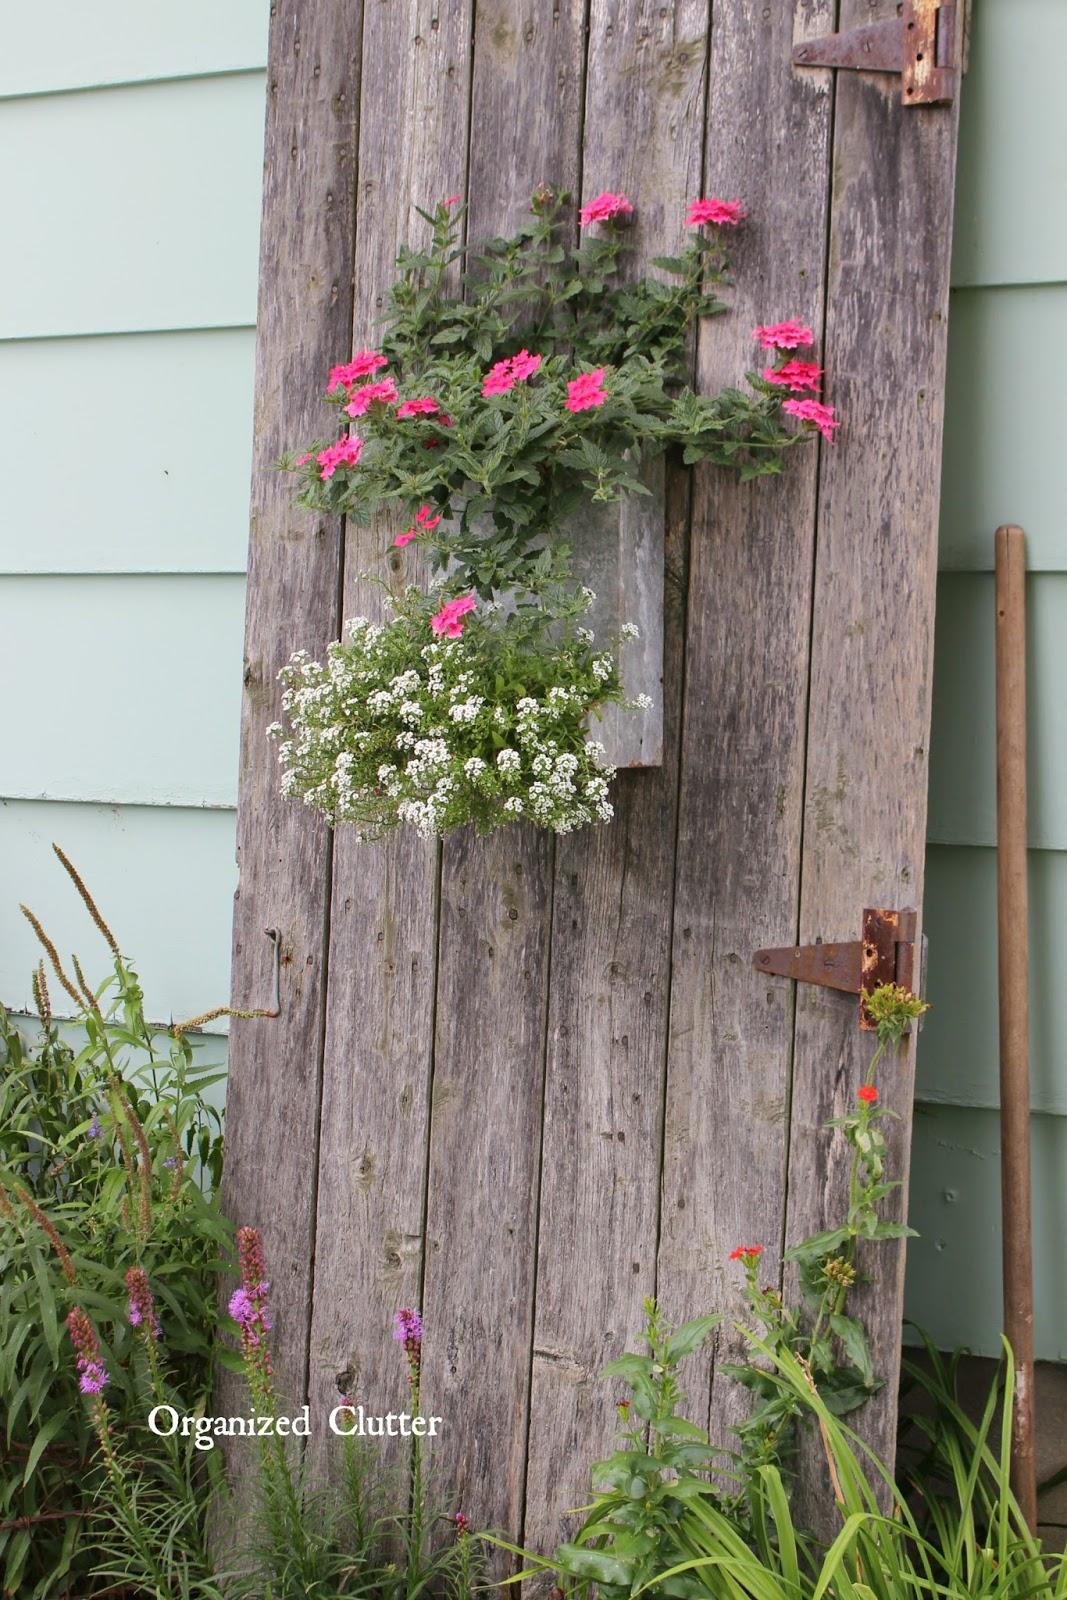 My Friend Danita's Rustic Garden Decor   Organized Clutter on Rustic Backyard Ideas id=50931